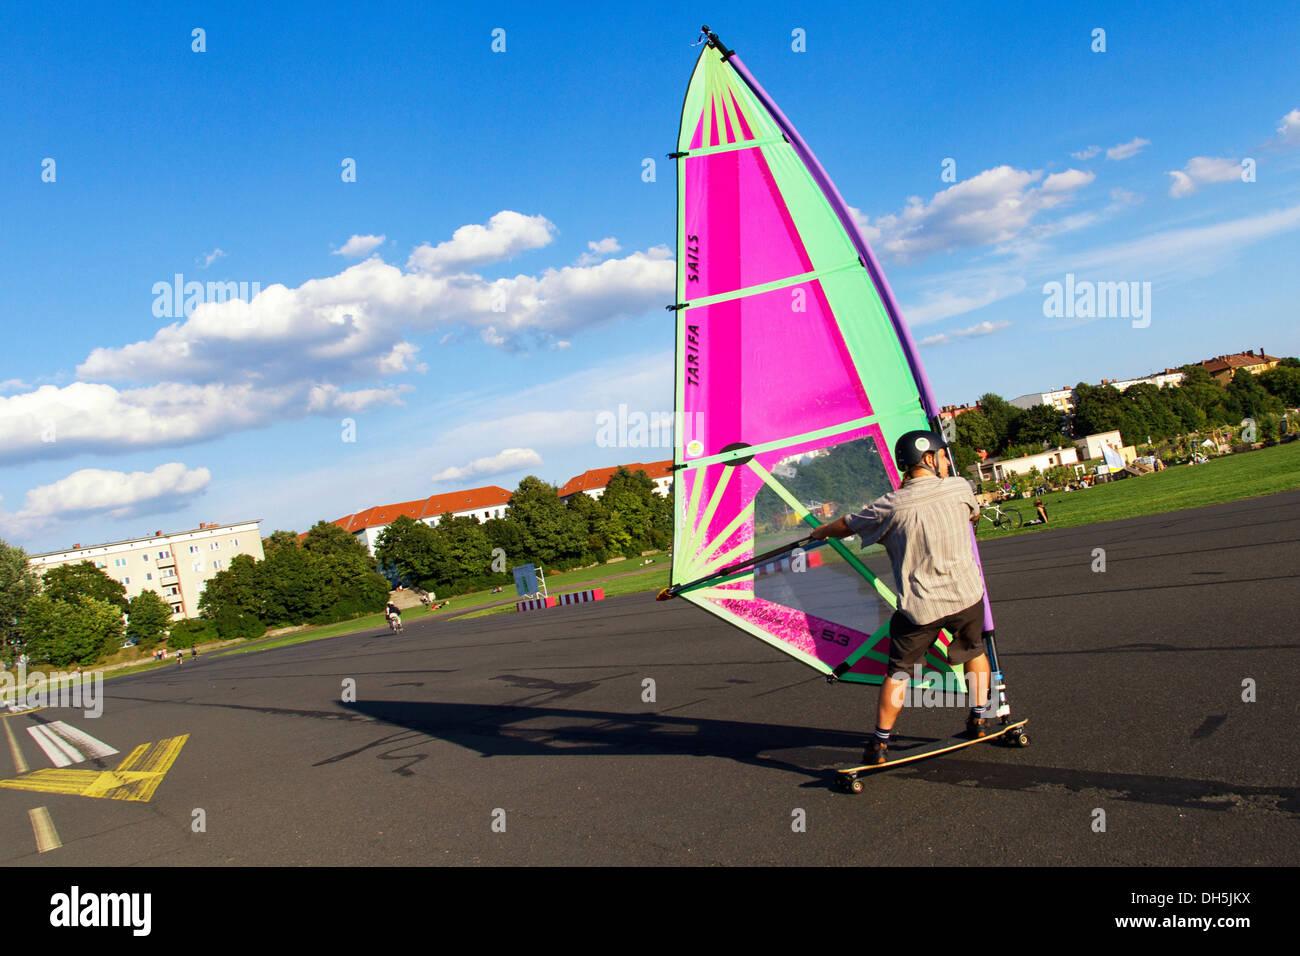 Windskater practicing on the asphalt runway with a windsurfer sail and a longboard, Berlin-Tempelhof, Tempelhofer Feld, Berlin - Stock Image